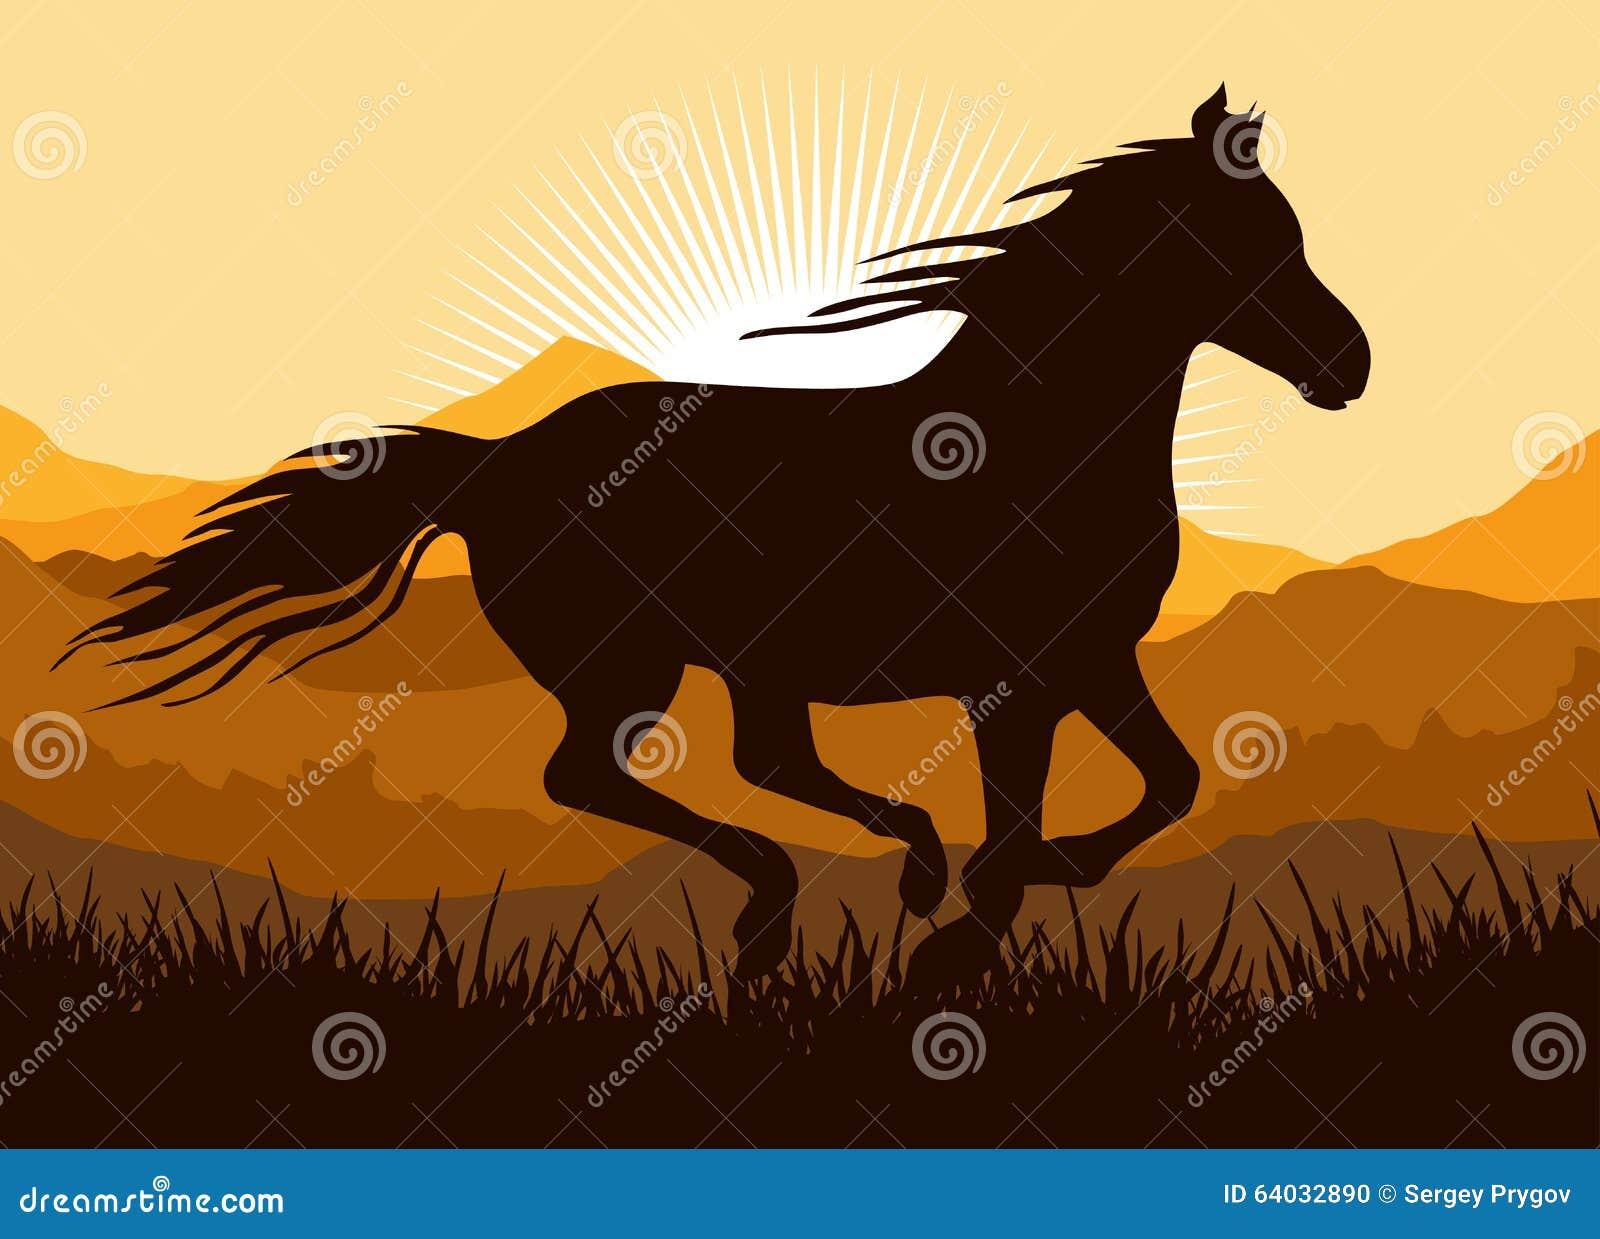 Horse Running Sunset Stock Illustrations 203 Horse Running Sunset Stock Illustrations Vectors Clipart Dreamstime